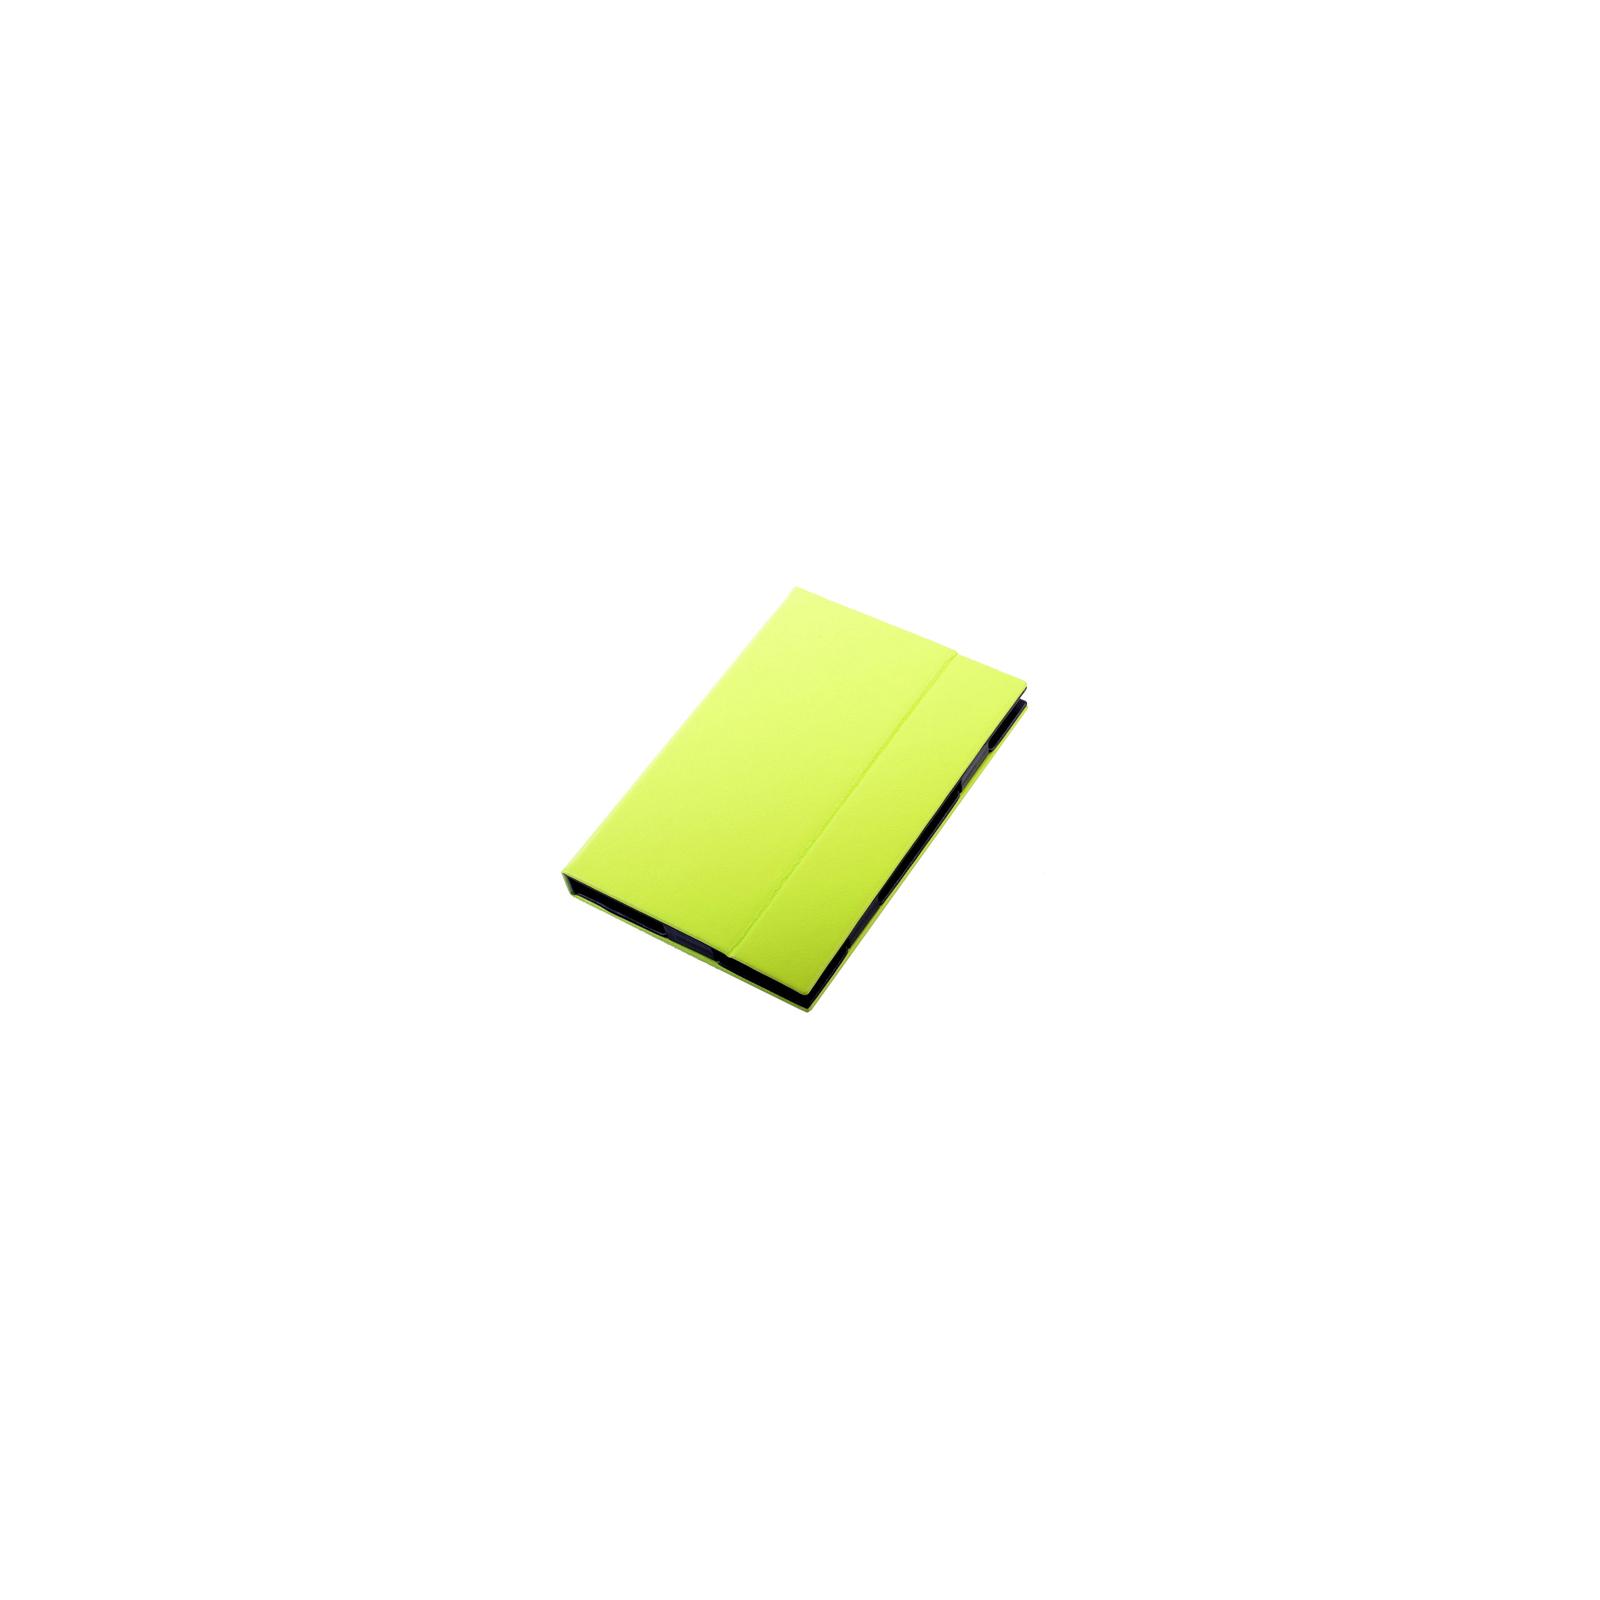 Чехол для планшета Vento 10.1 Desire Bright - lime